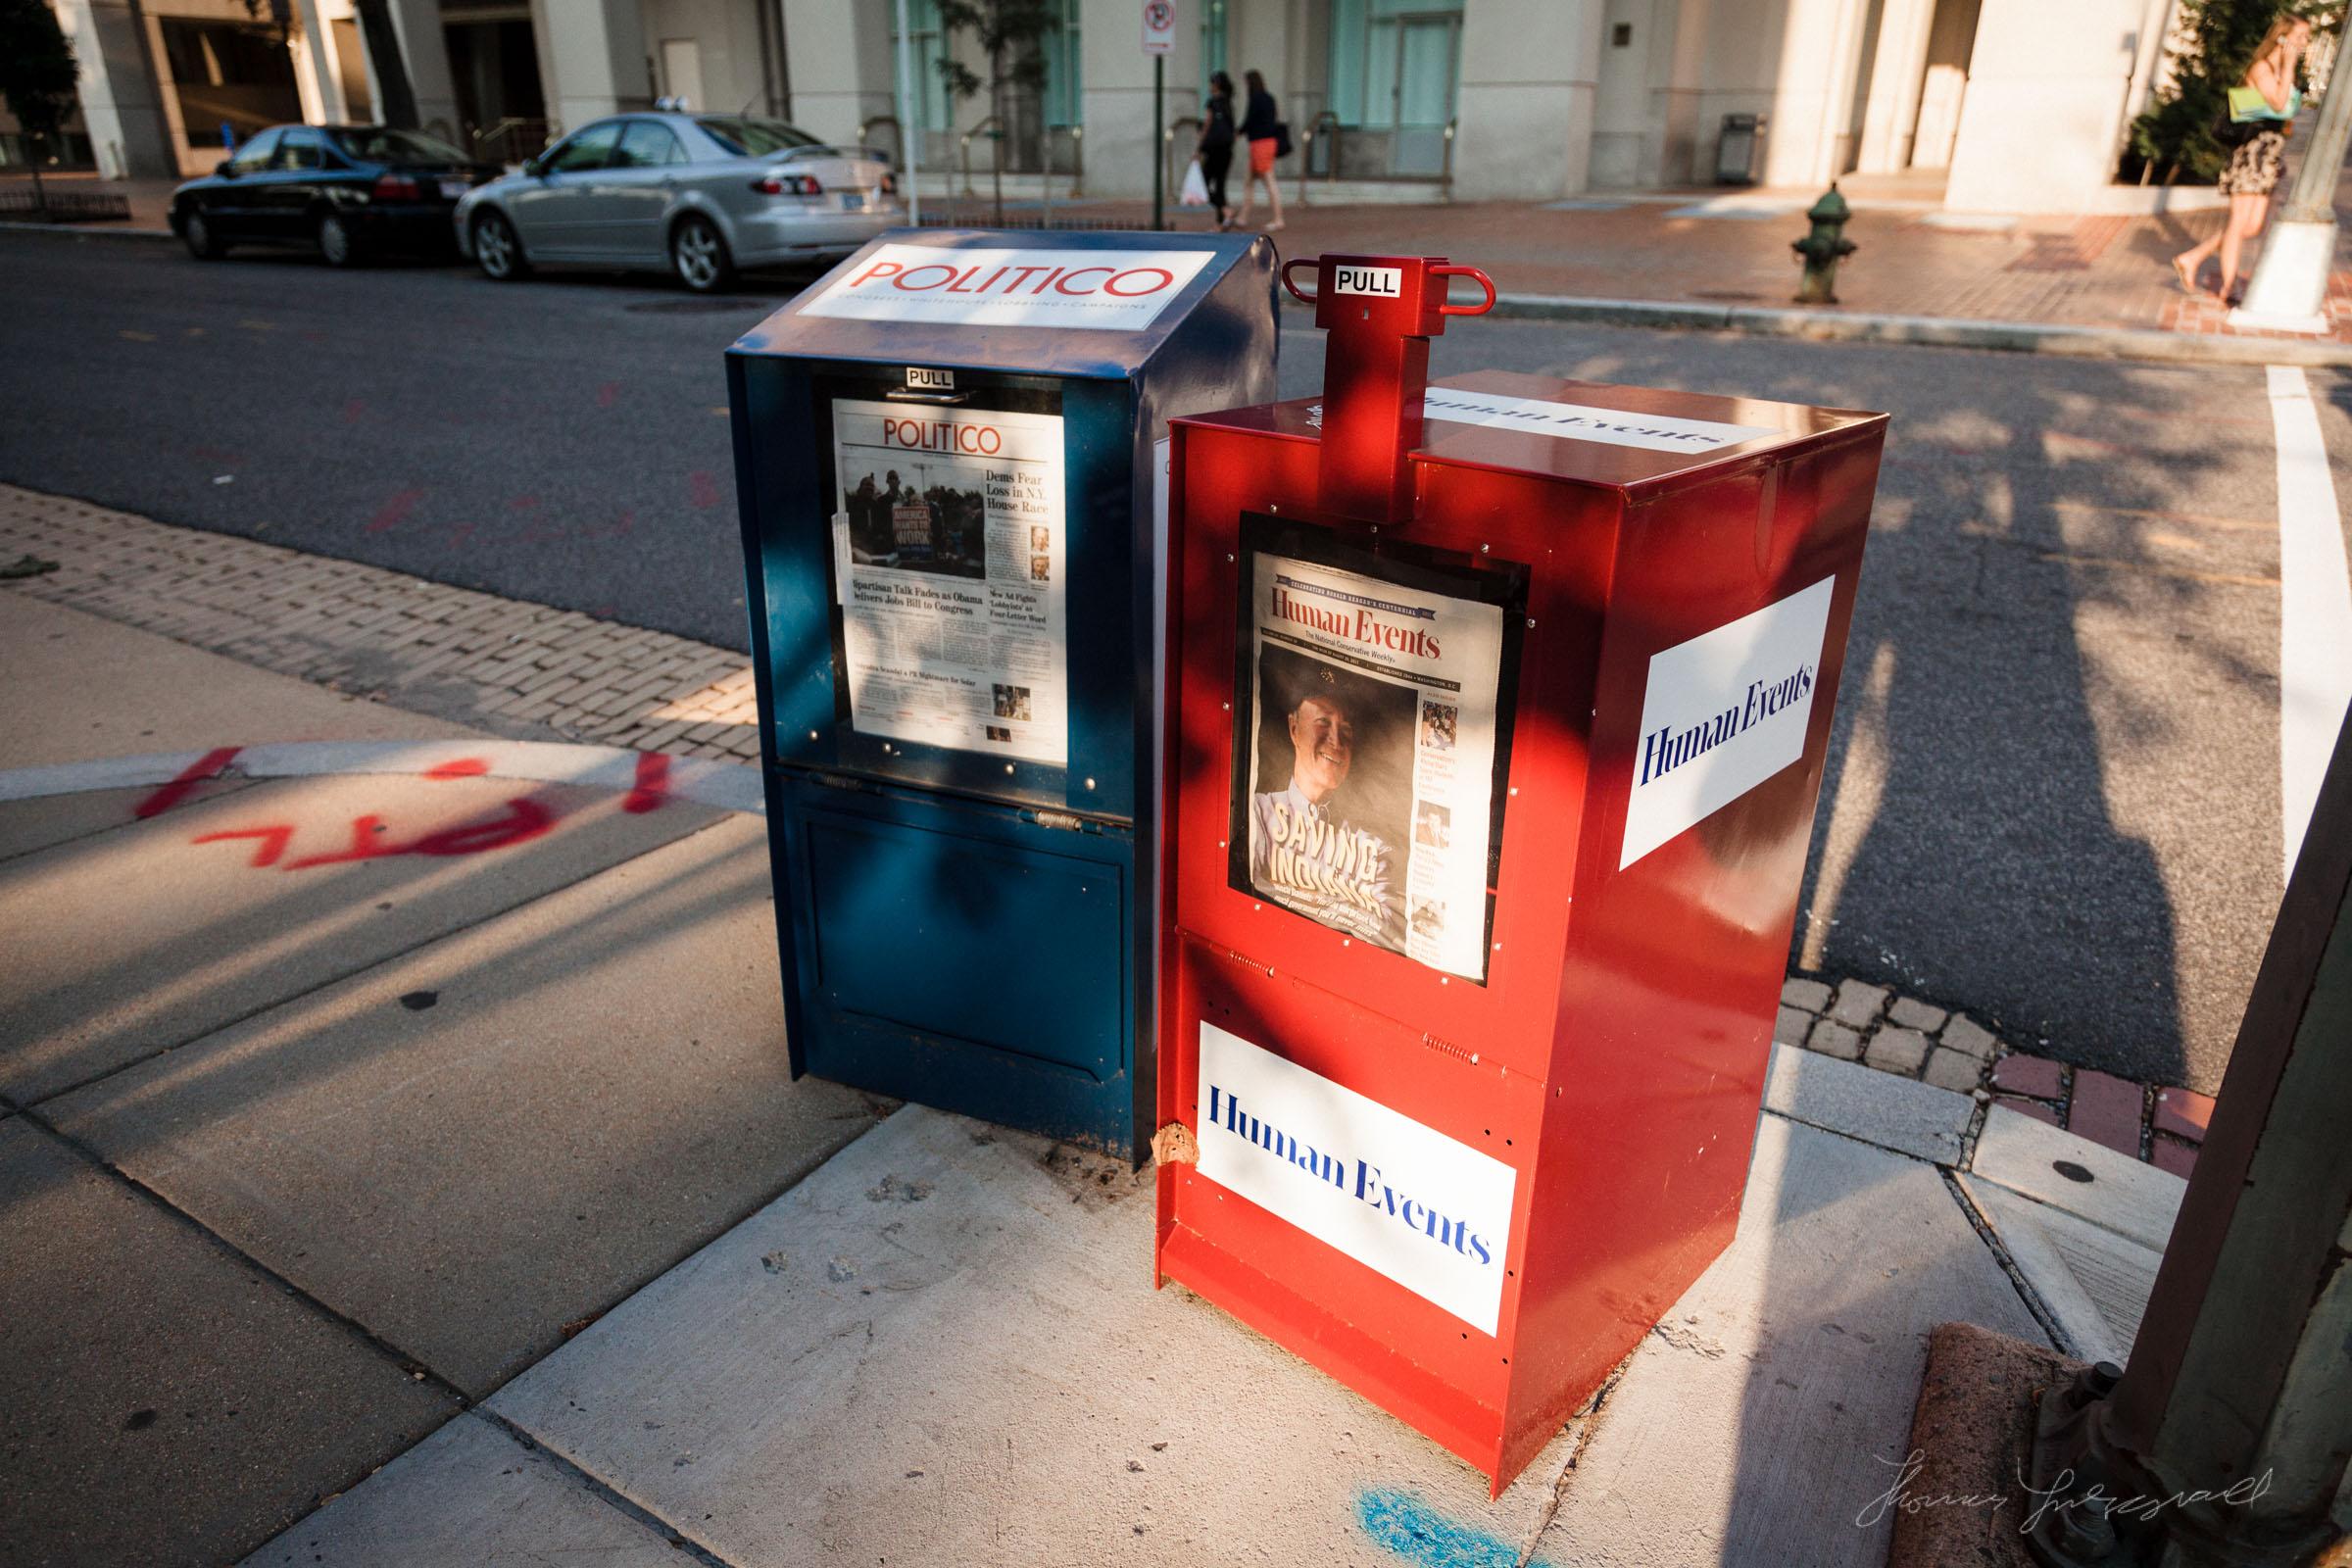 Newspaper Stands